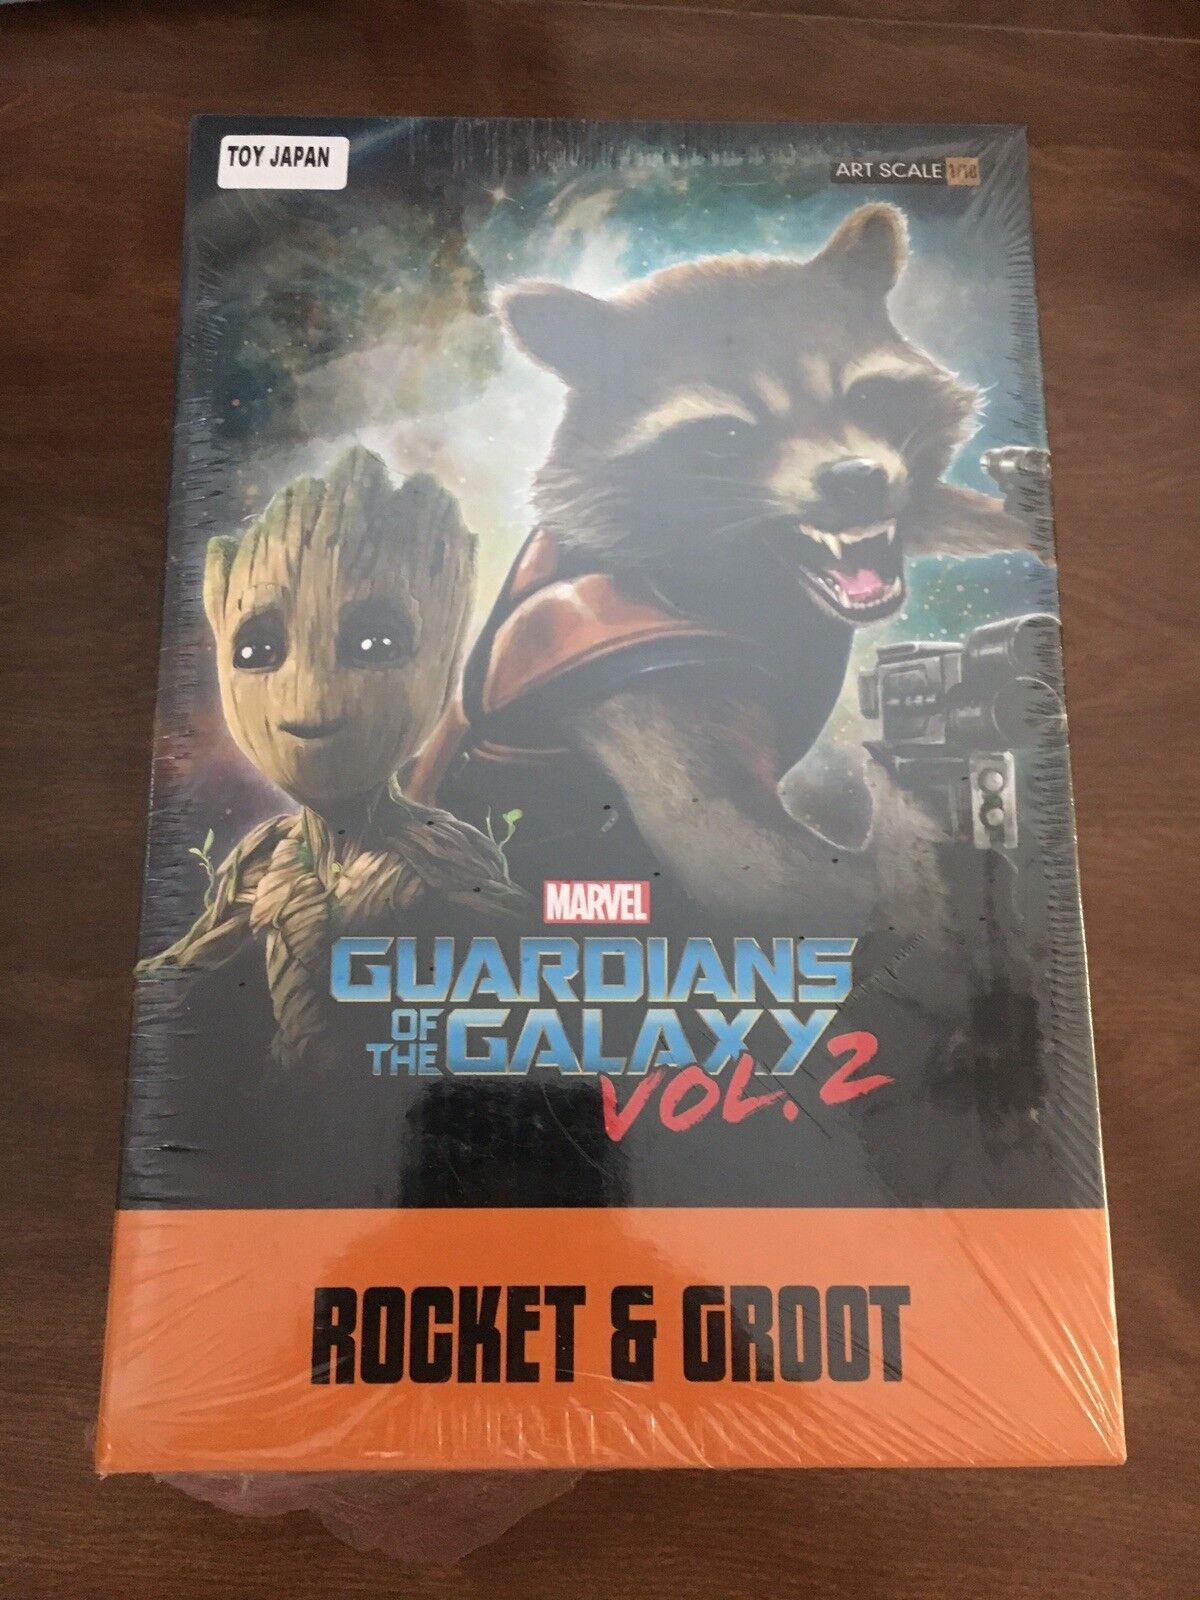 Iron Studios Guardianes de la Galaxia vol. 2 Rocket & bebé bailarín 1:10 bds Estatua